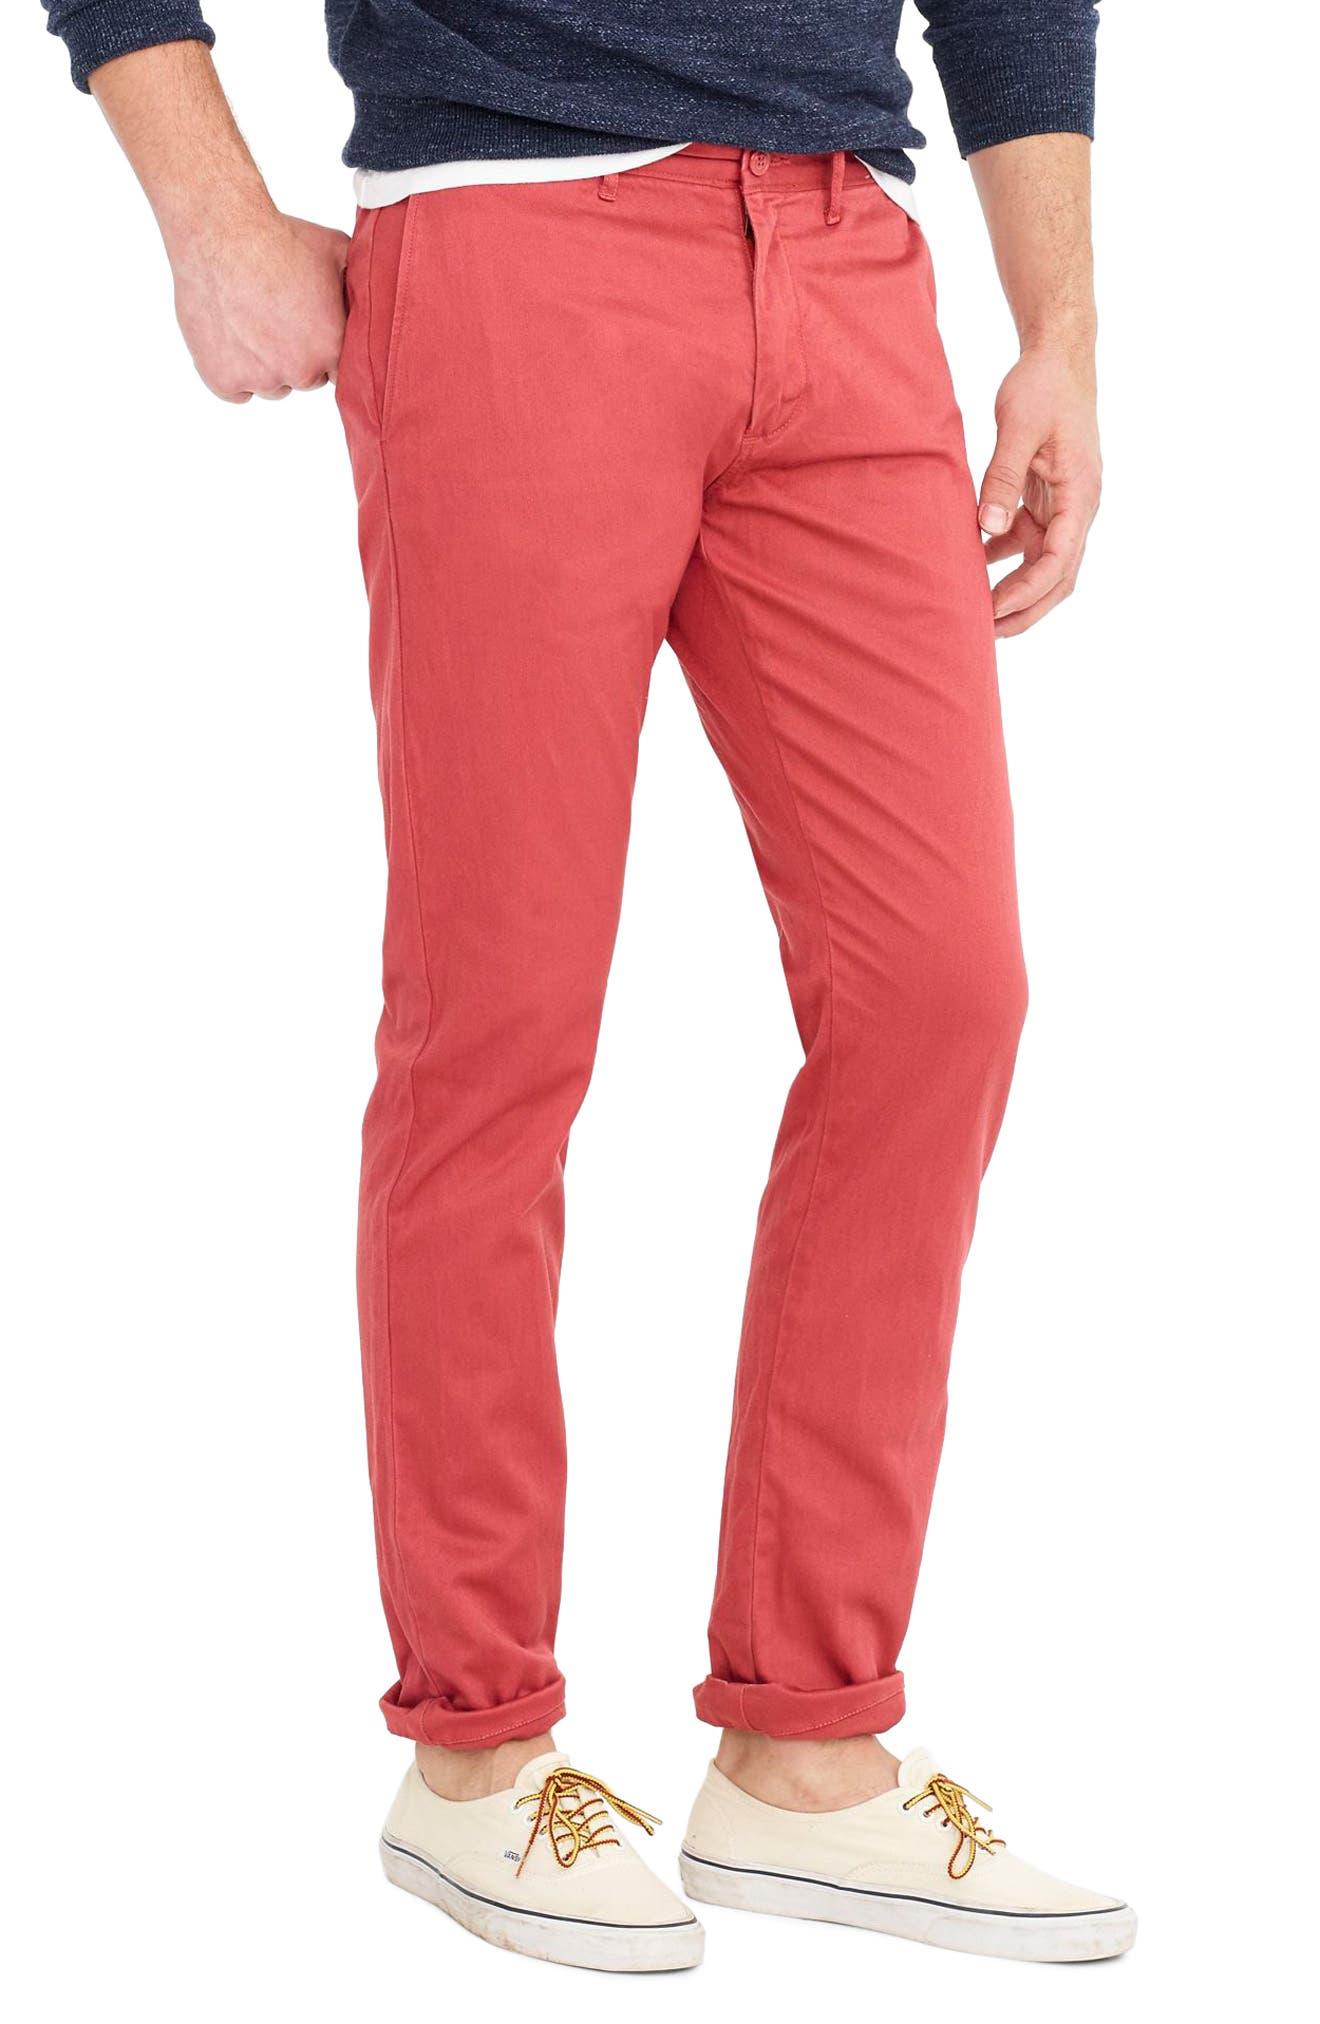 Alternate Image 3  - J.Crew 484 Slim Fit Stretch Chino Pants